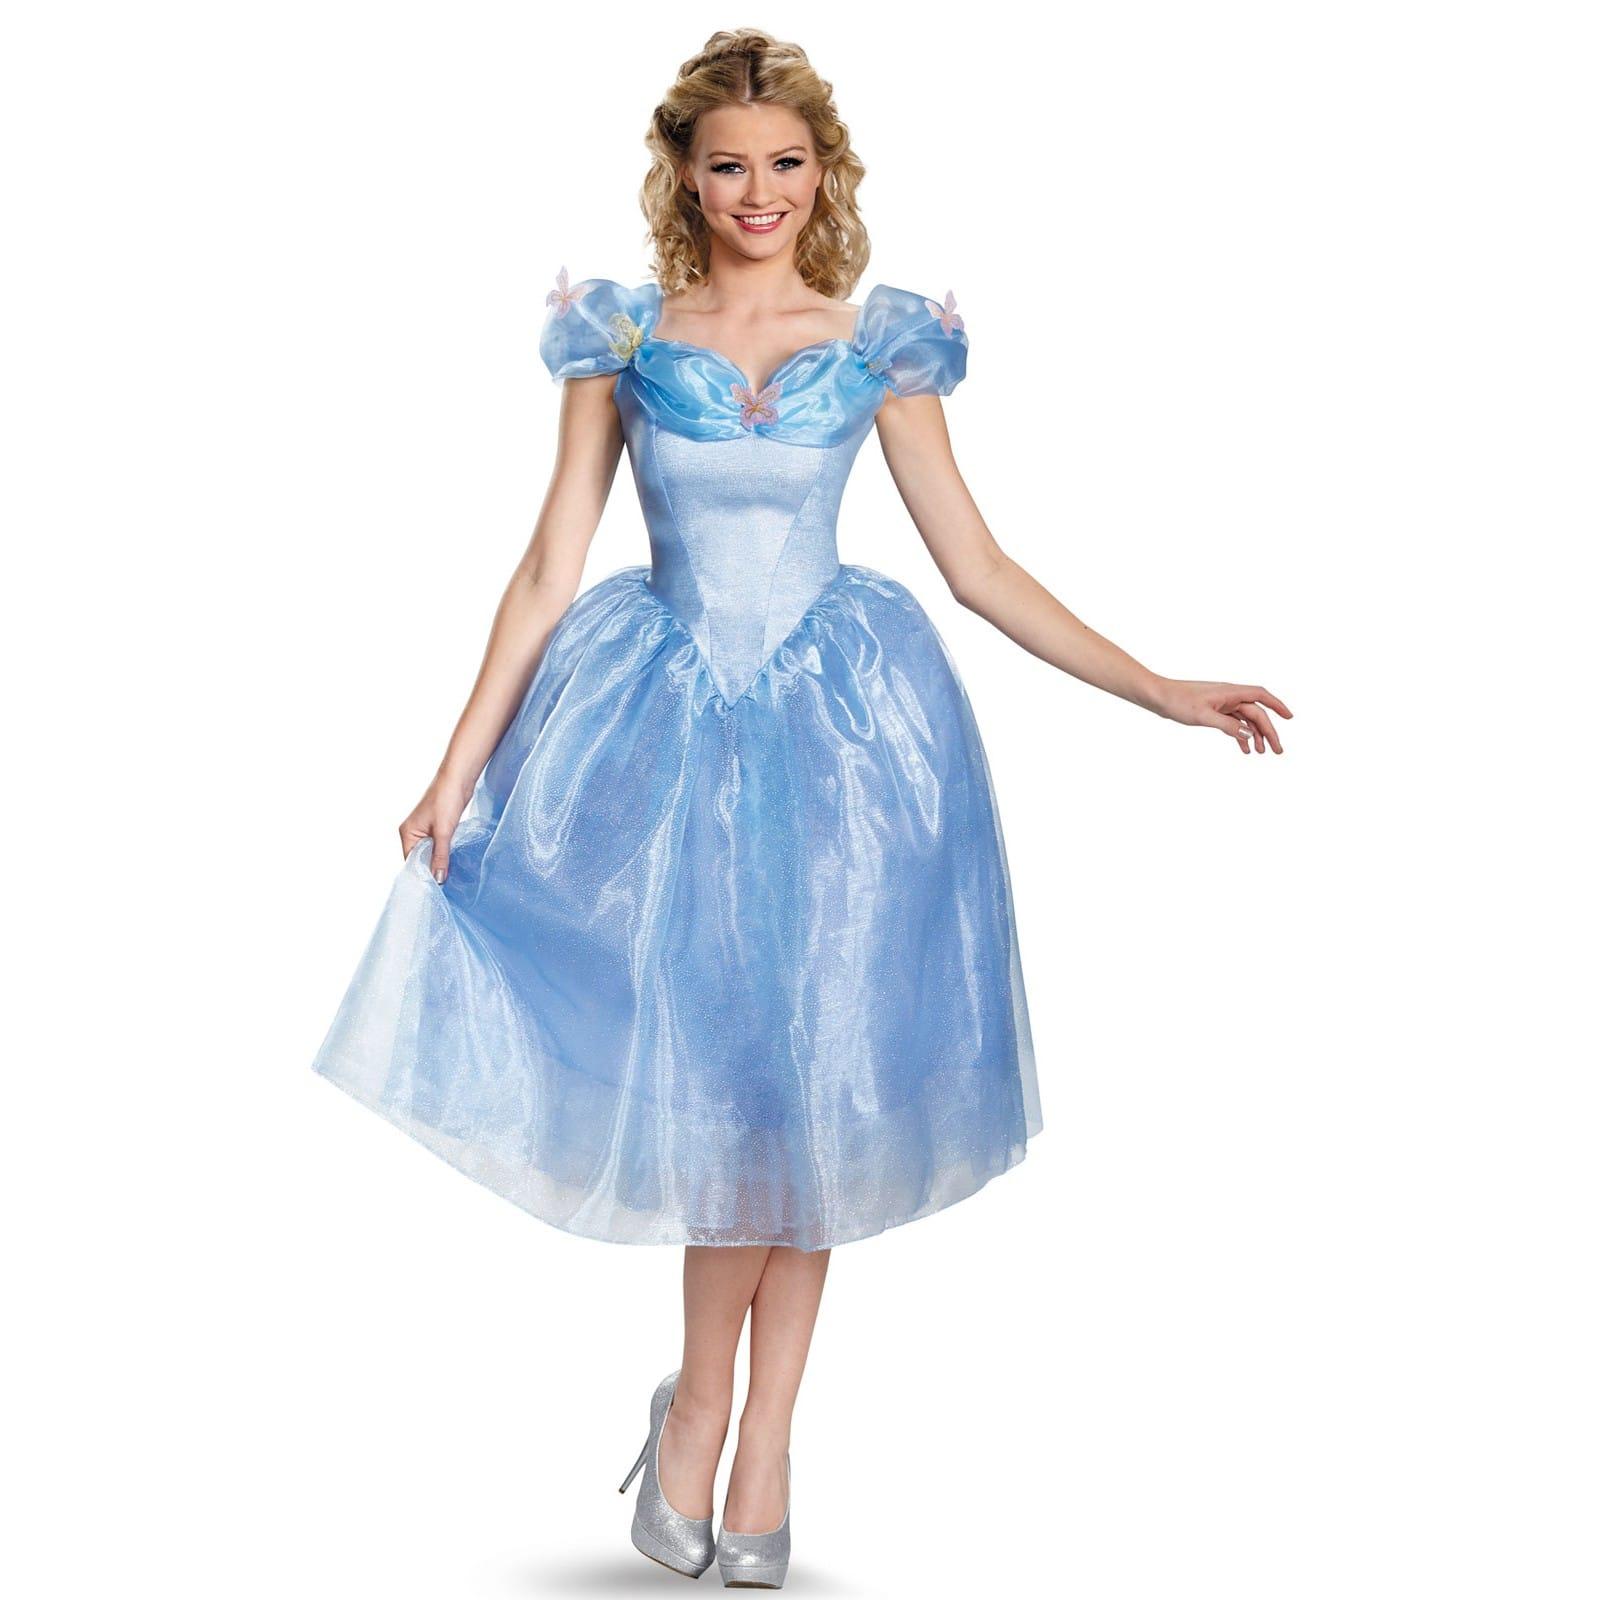 Cinderella Free